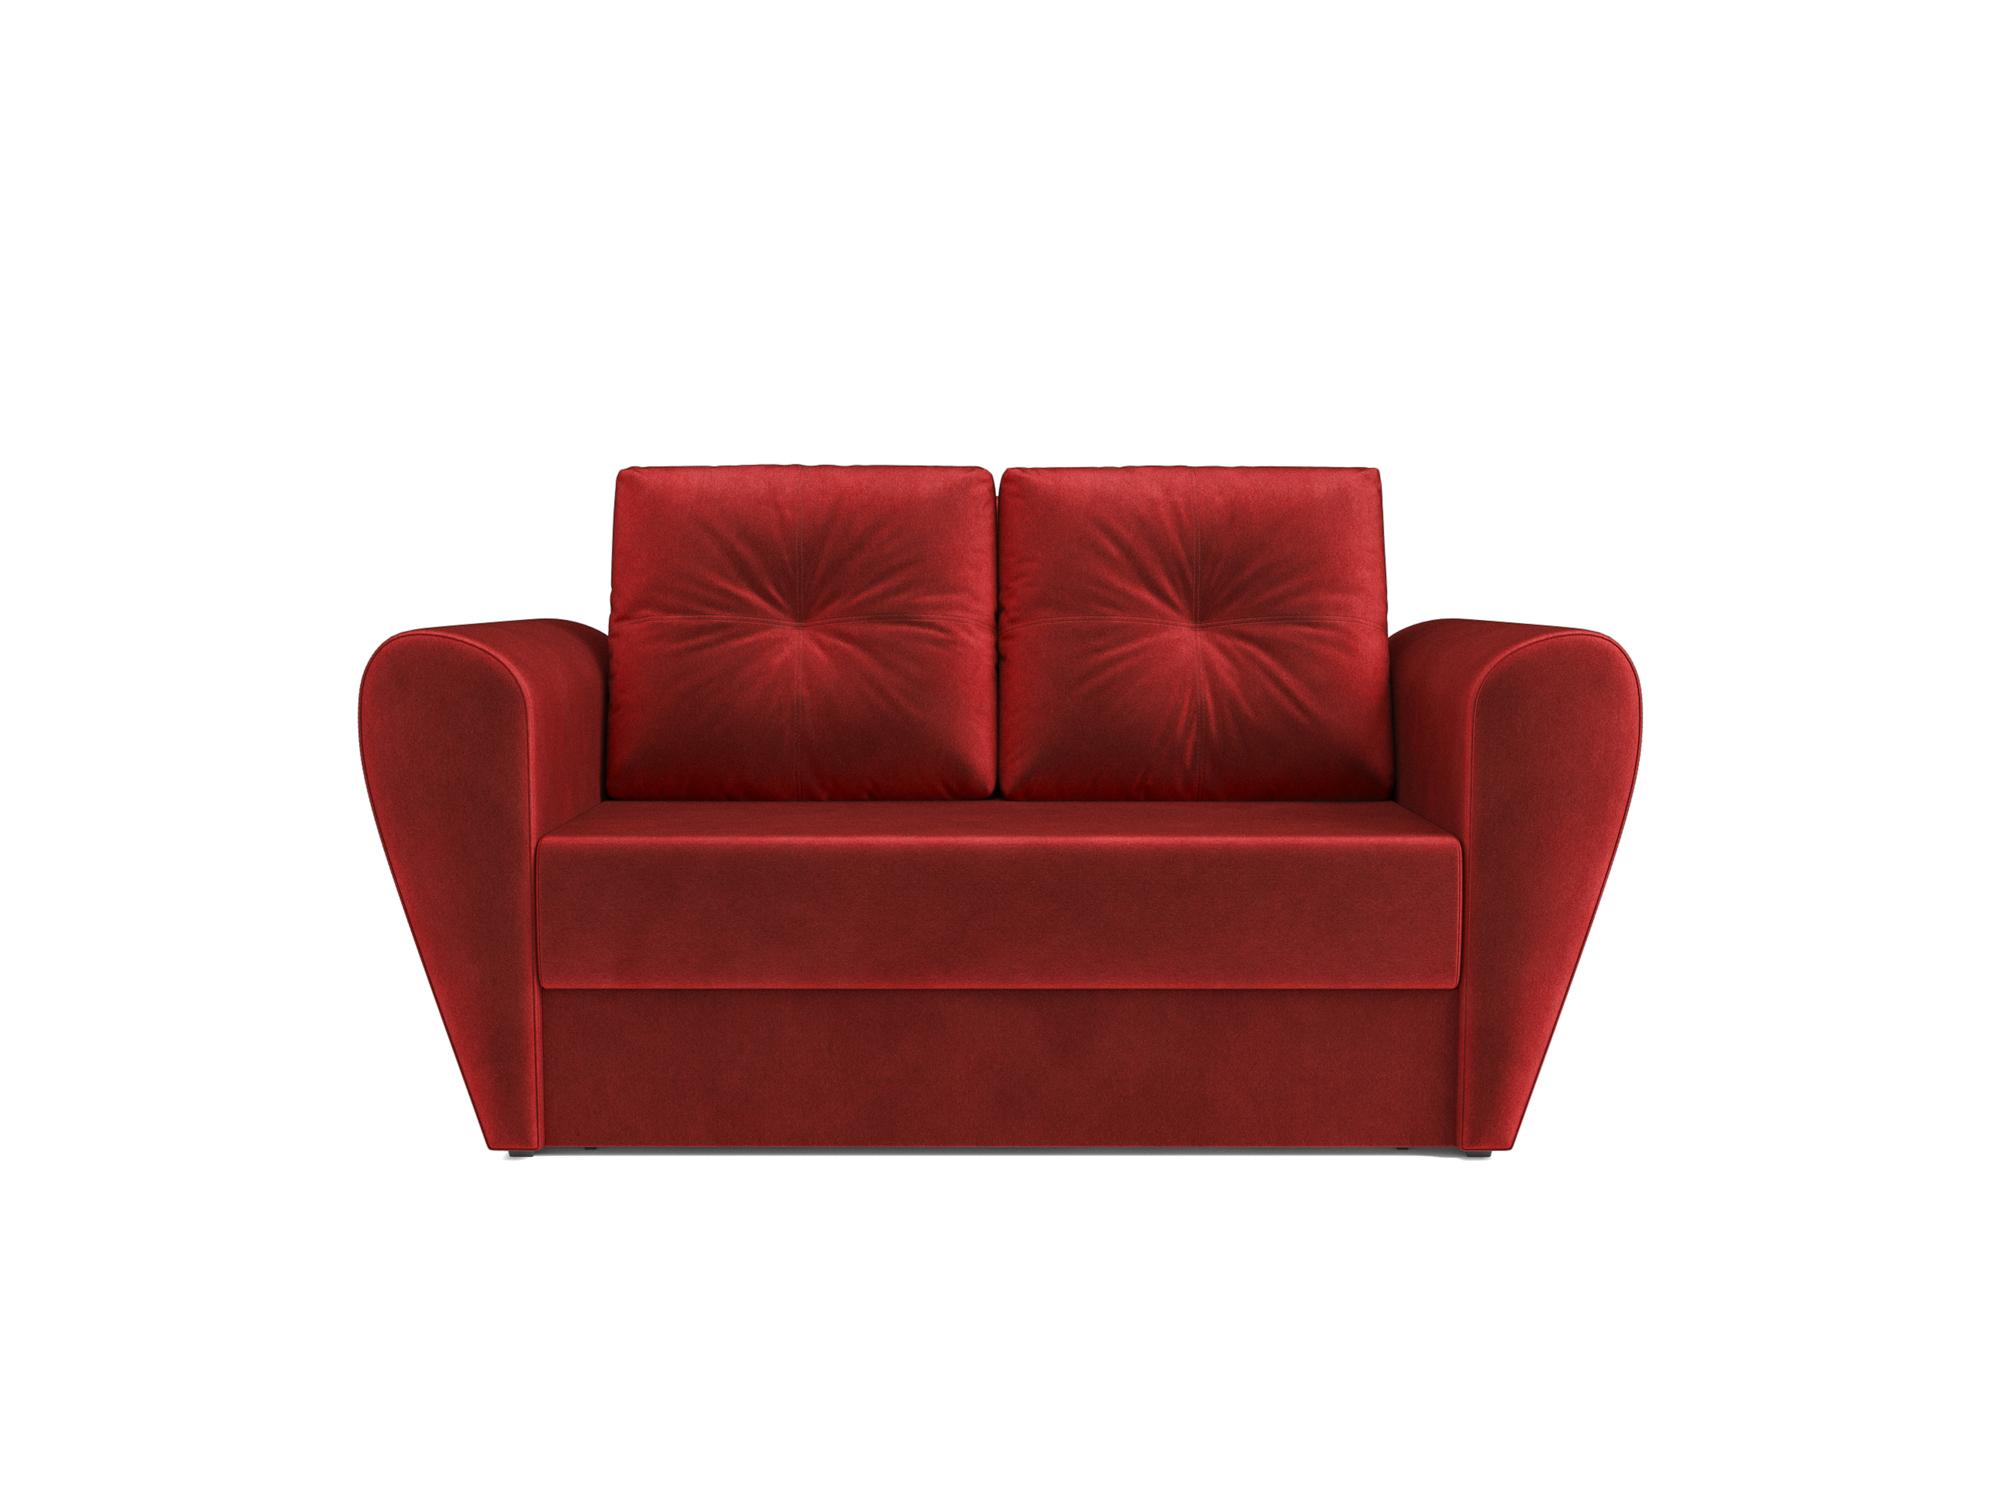 Диван Квартет MebelVia Красный, Вельвет бархатного типа, Брус сосны диван квартет mebelvia бежевый вельвет бархатного типа брус сосны